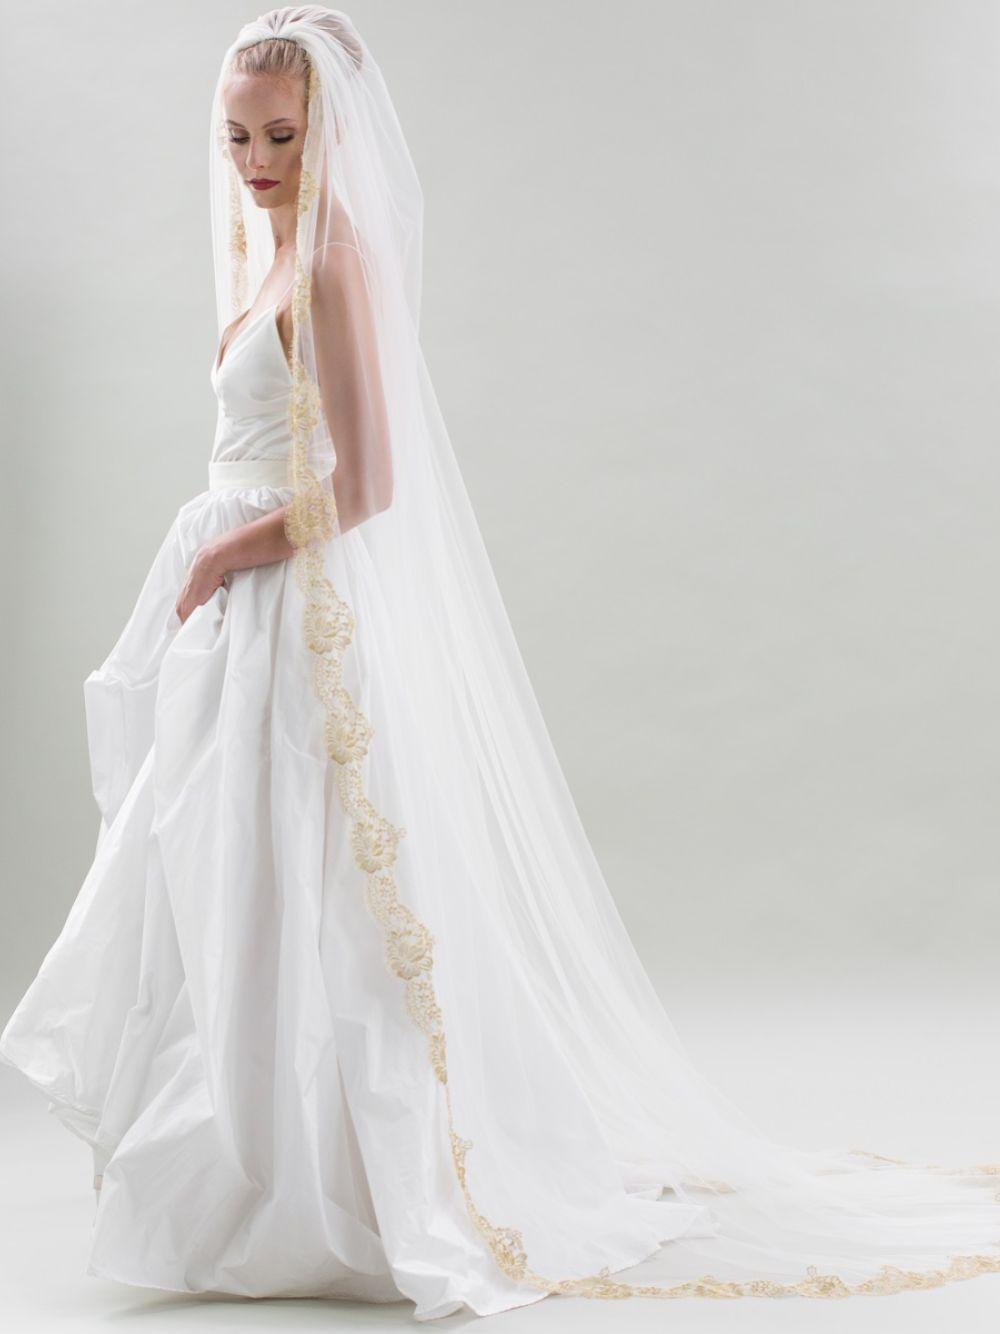 Joyce Jackson Naples Single Tier Gold Lace Edge Veil